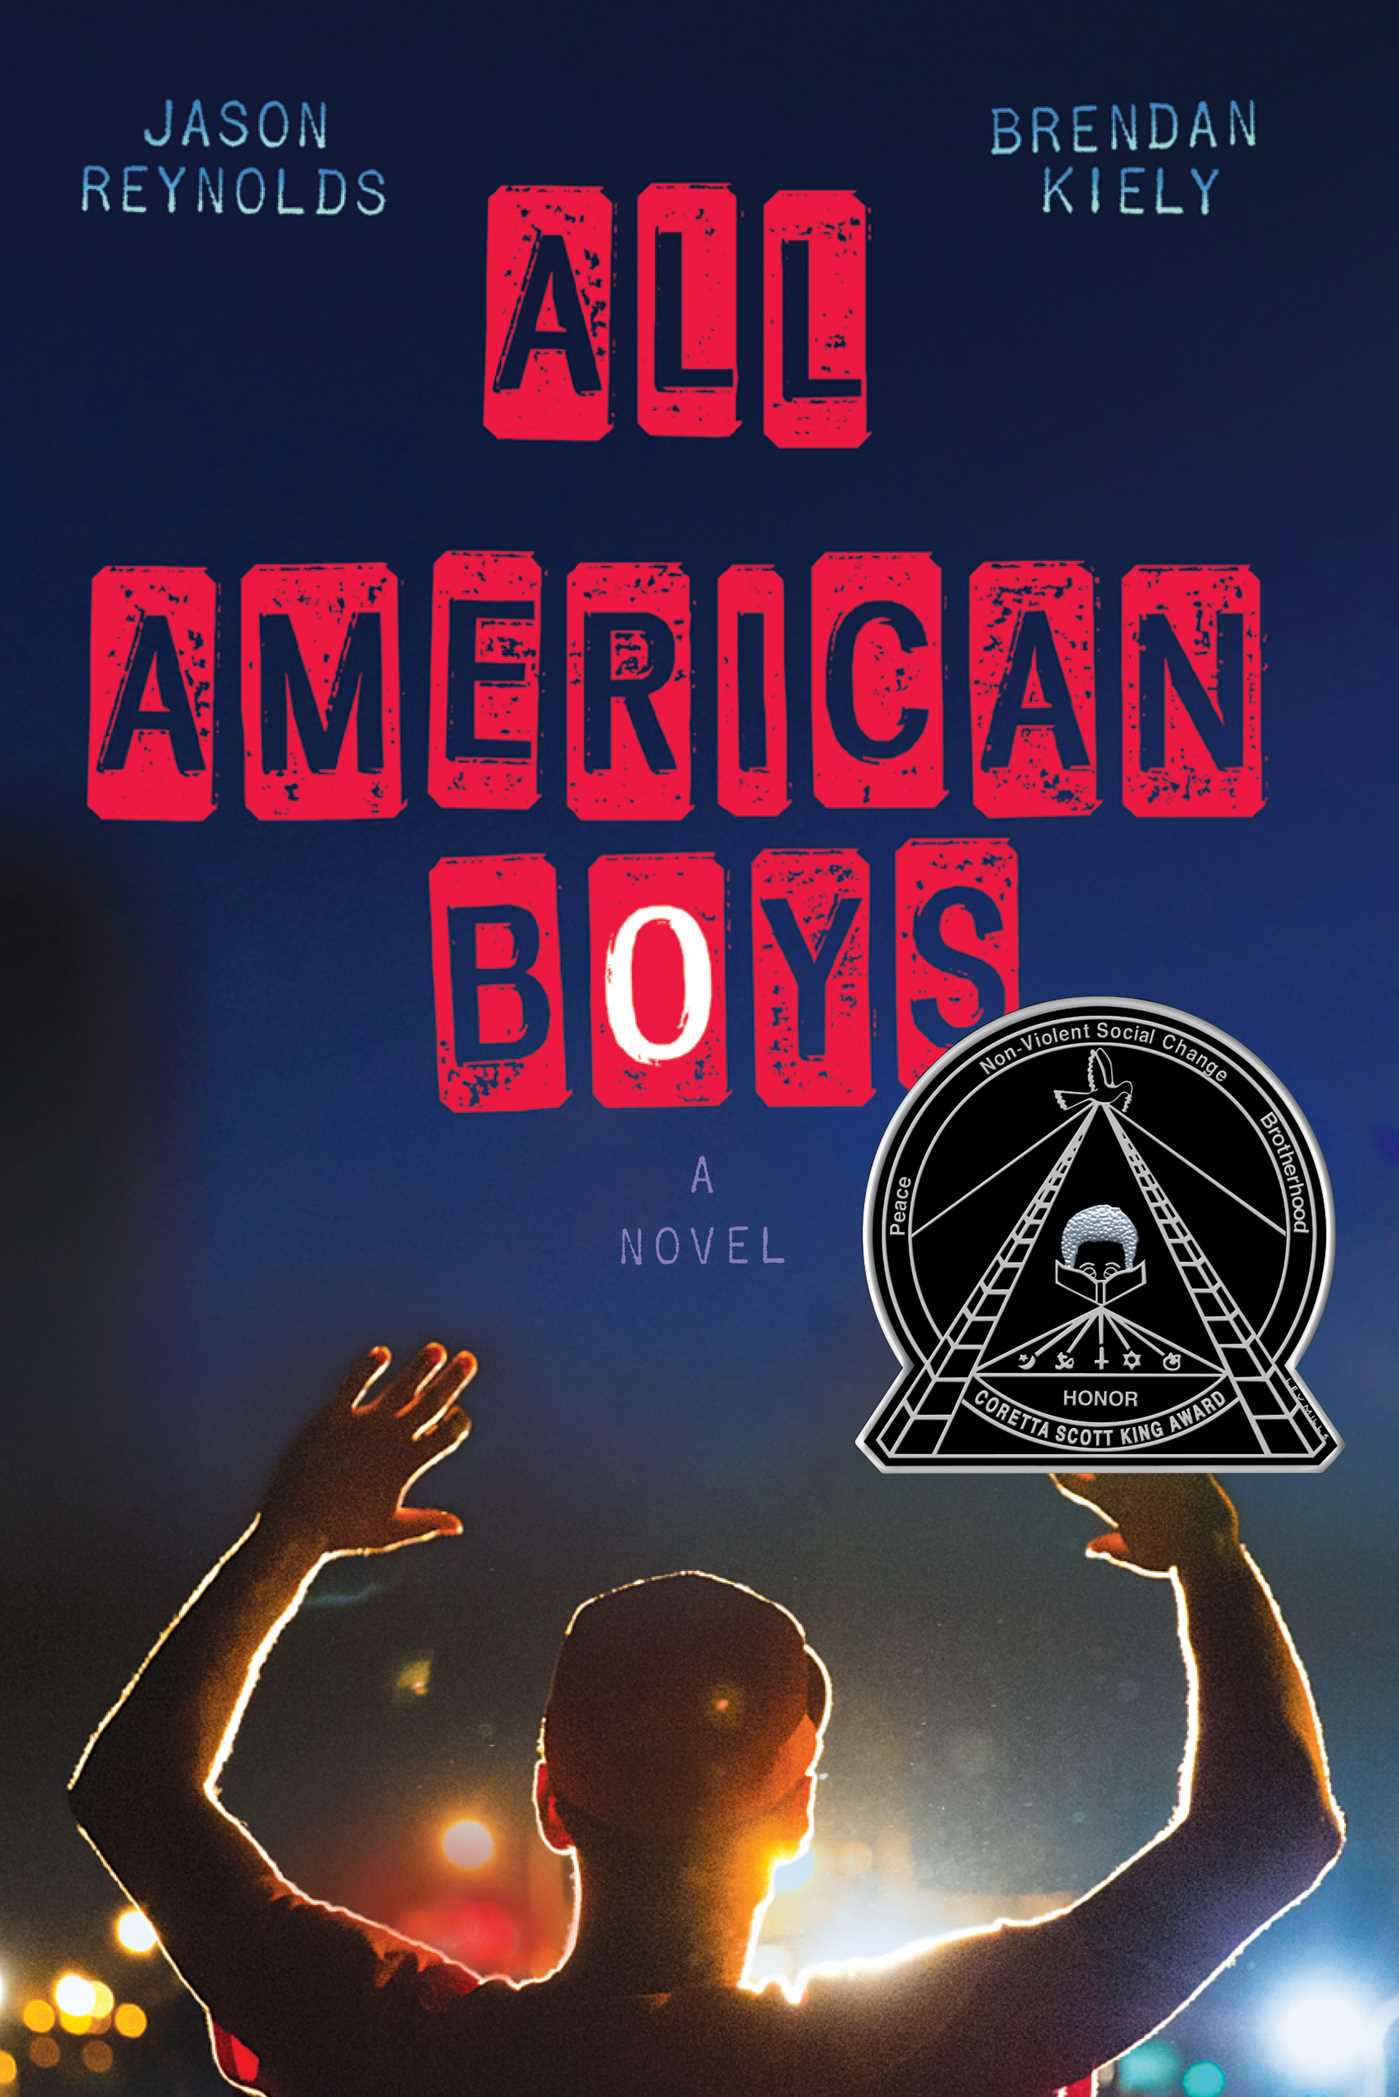 All American Boys by Jason and Reynolds and Brendan Kiely